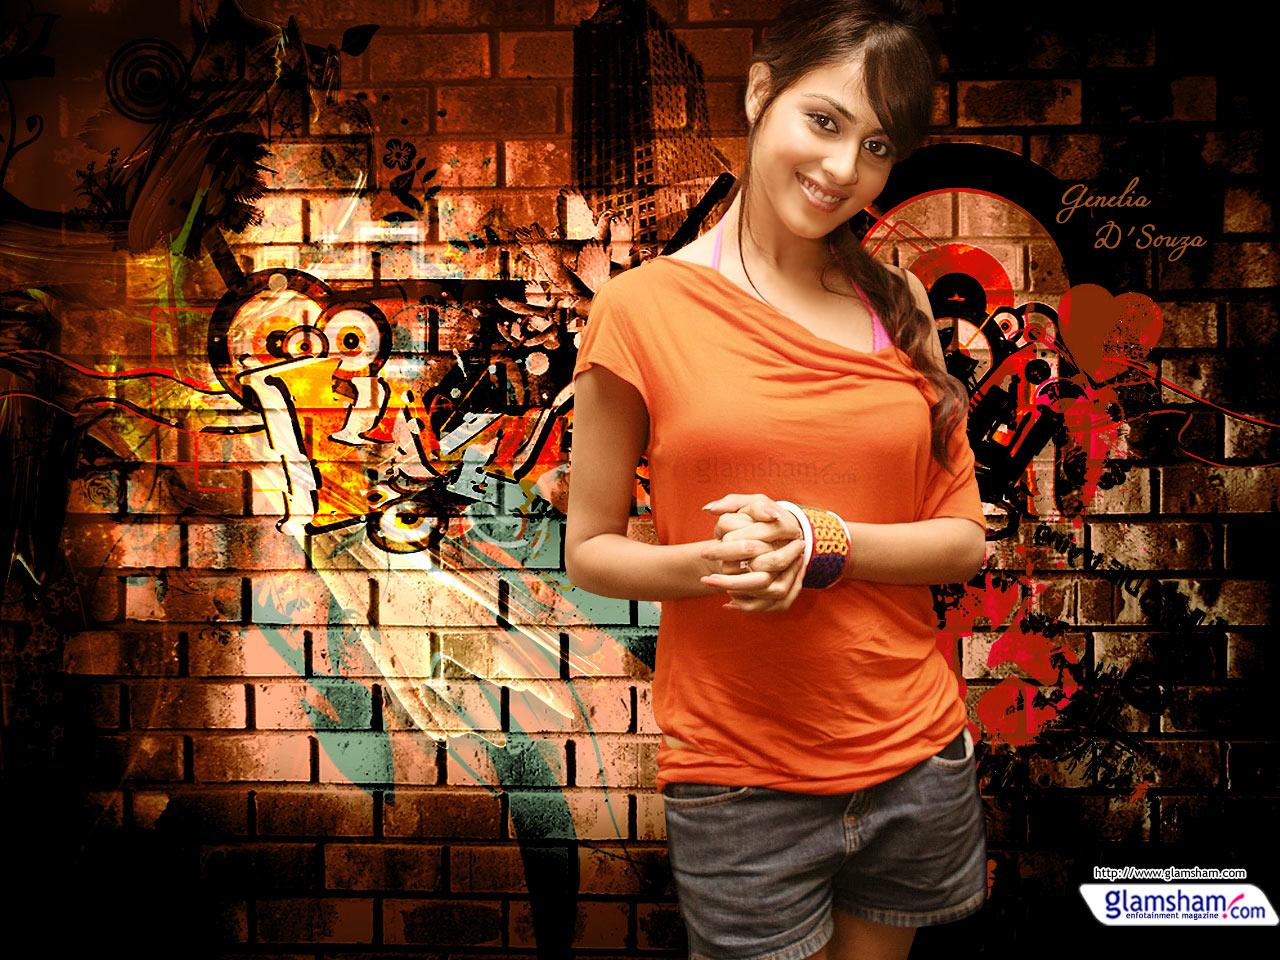 http://2.bp.blogspot.com/_P1DjZLm5WXk/TA3efubYVNI/AAAAAAAAEwU/POlOWdbzKl4/s1600/genelia+Wallpapers7.jpg